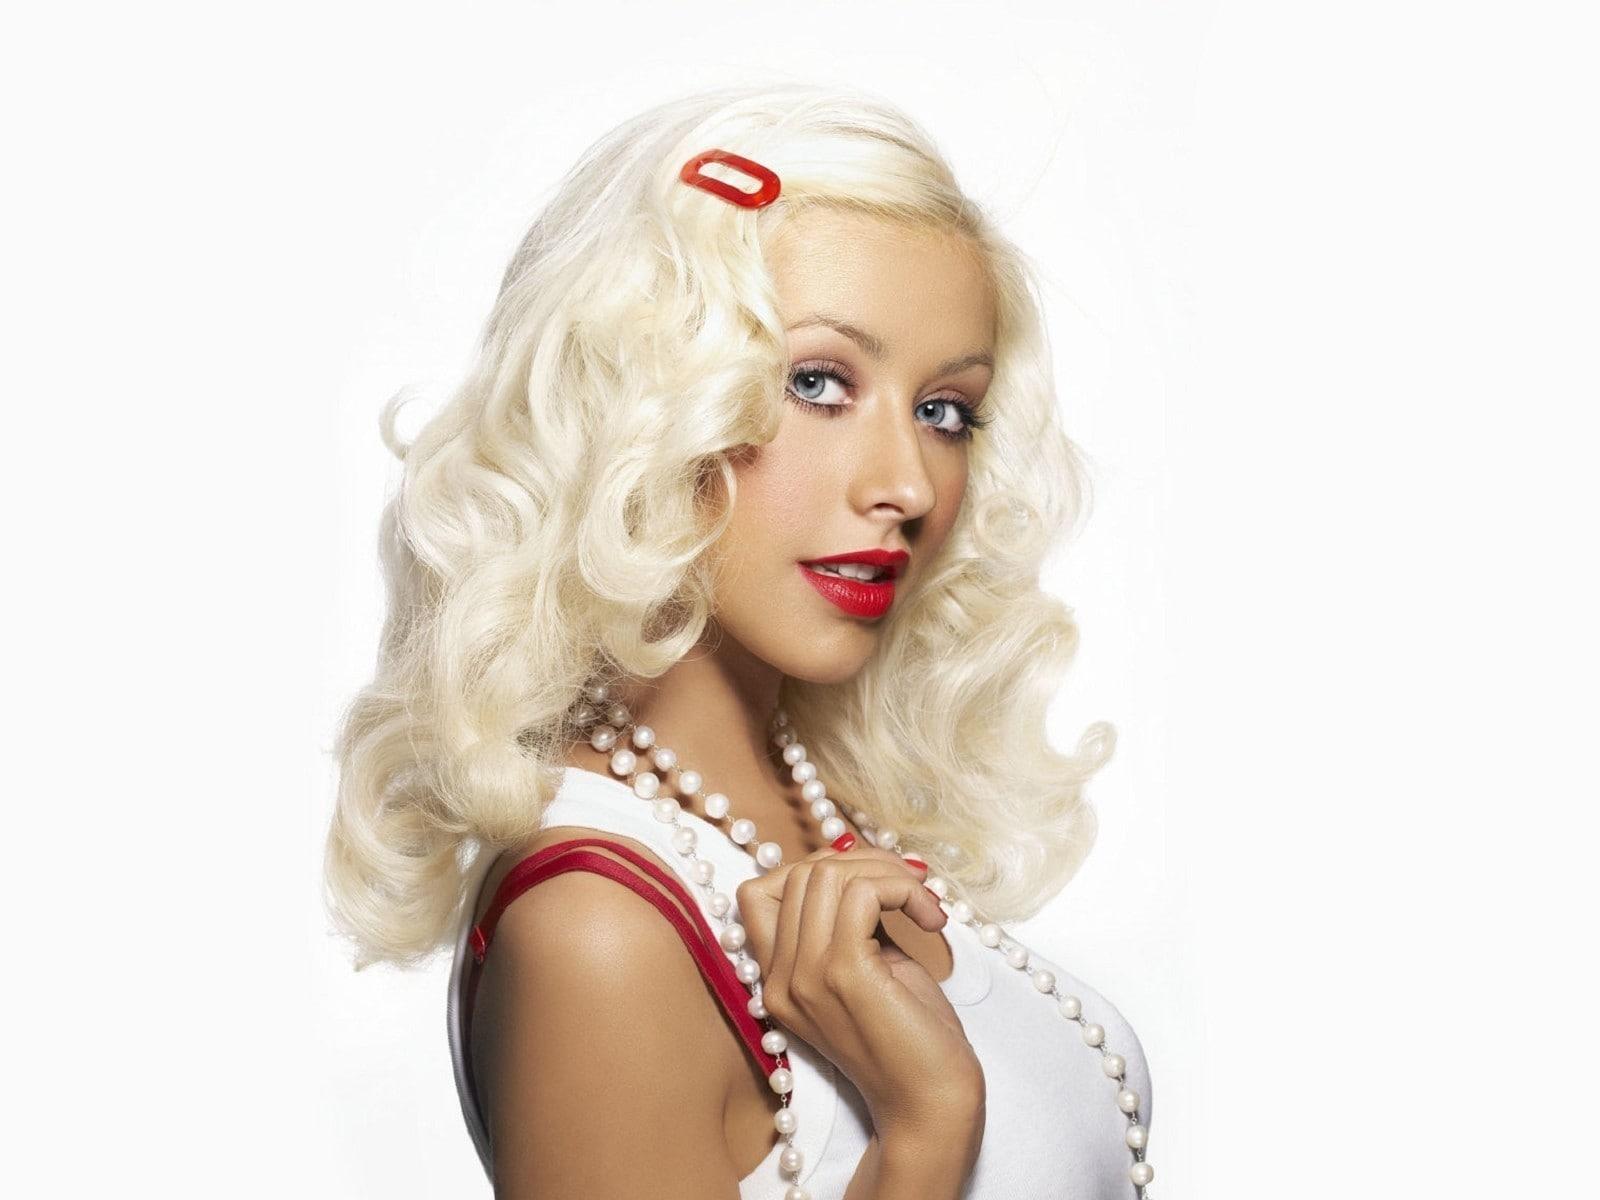 Christina Aguilera Wallpapers